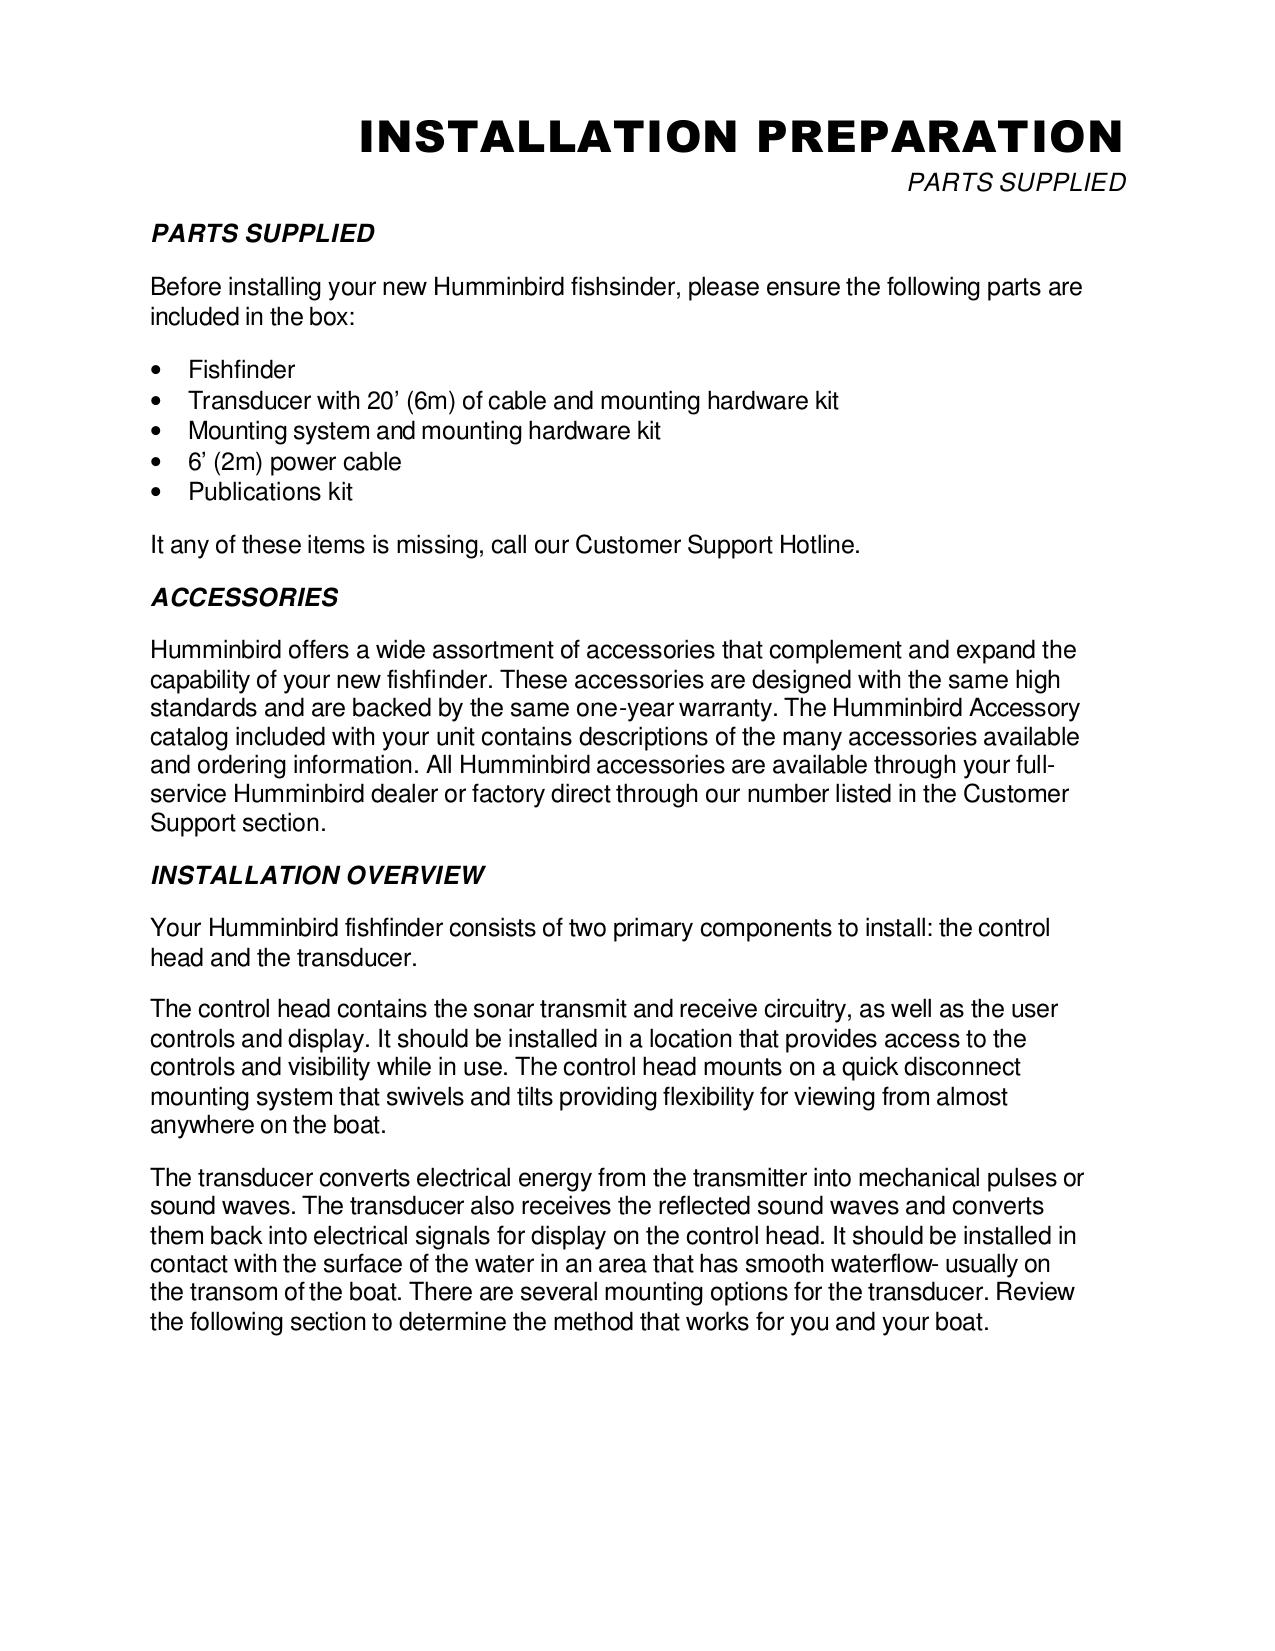 Humminbird fishfinder 565 owners manual.